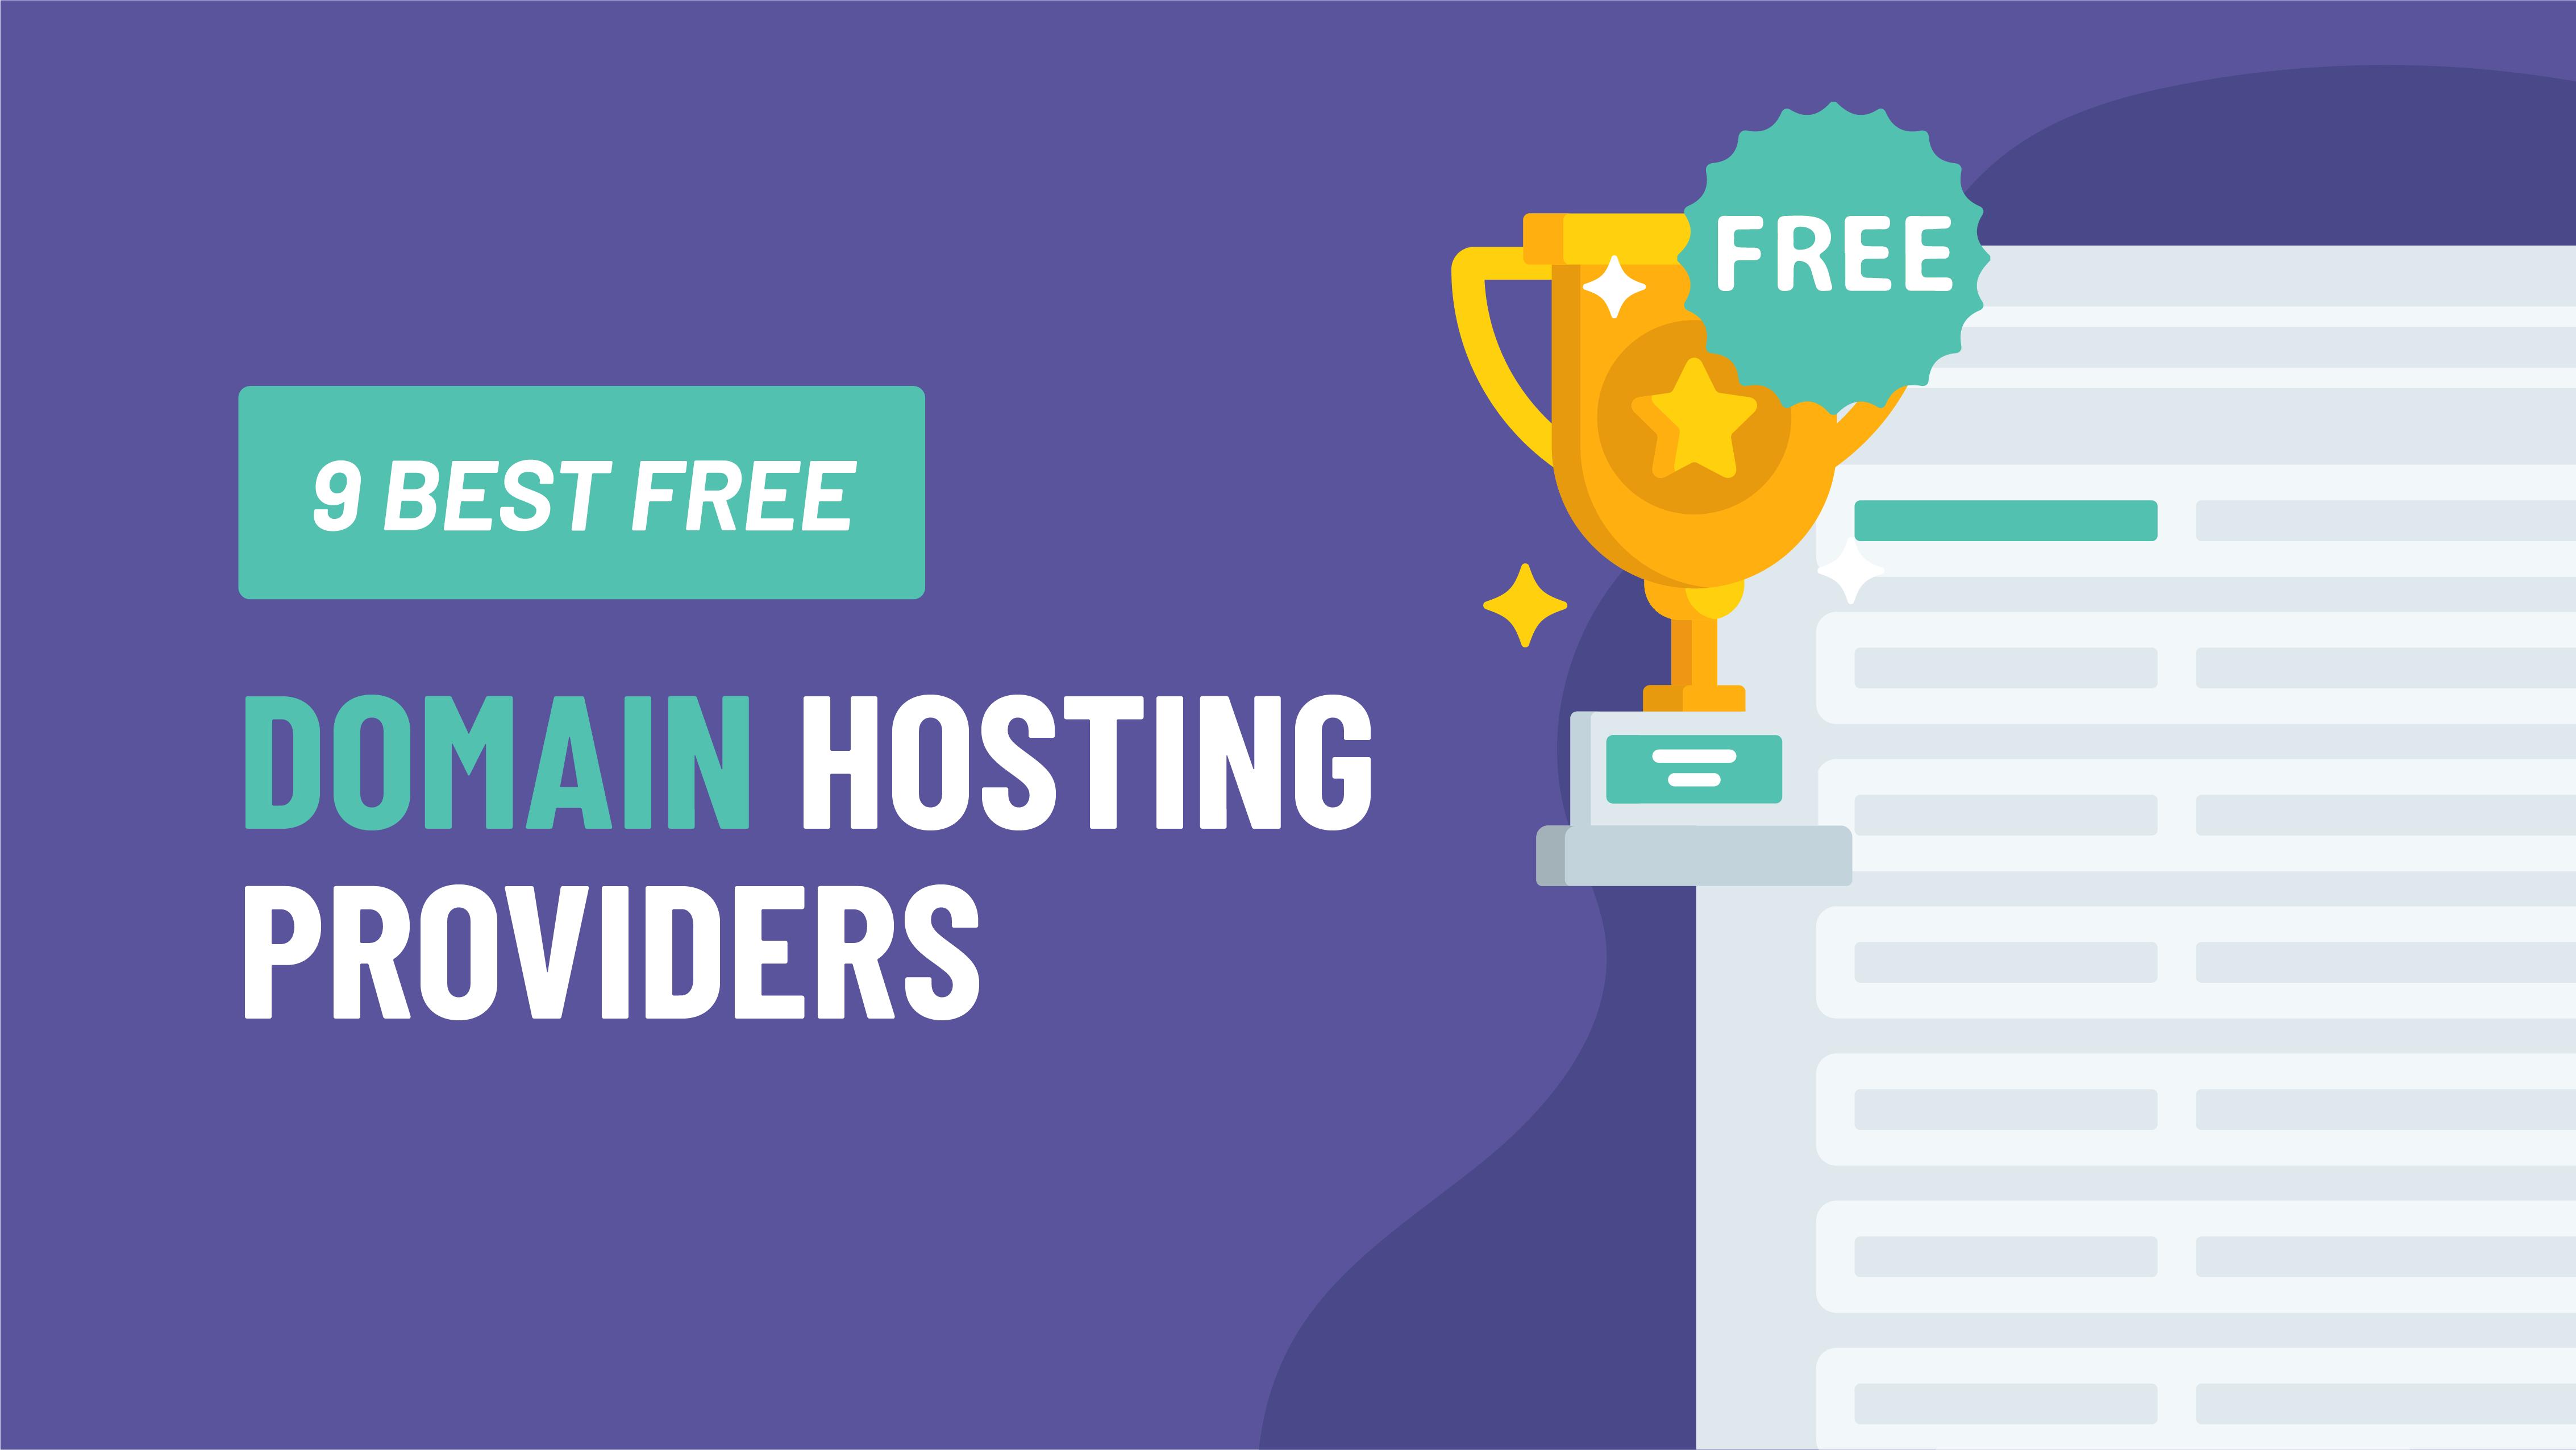 9 Best Free Domain Hosting Providers